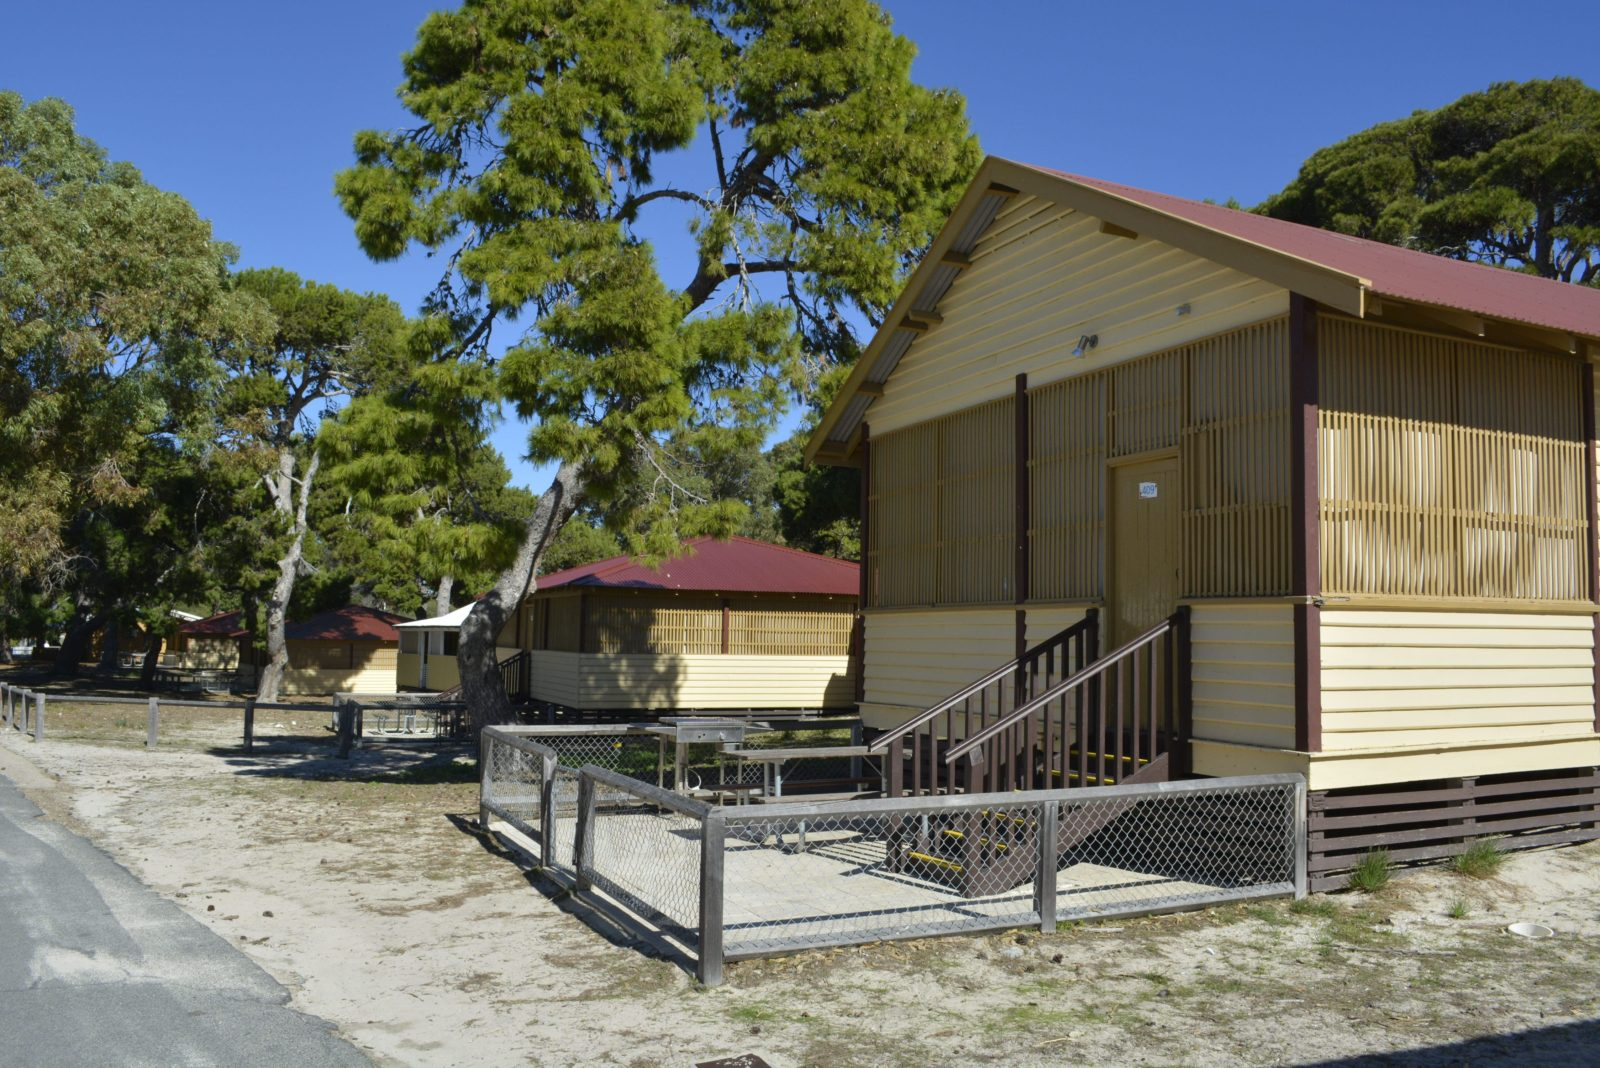 North Heritage Bungalows and Chalet, Rottnest Island, Western Australia